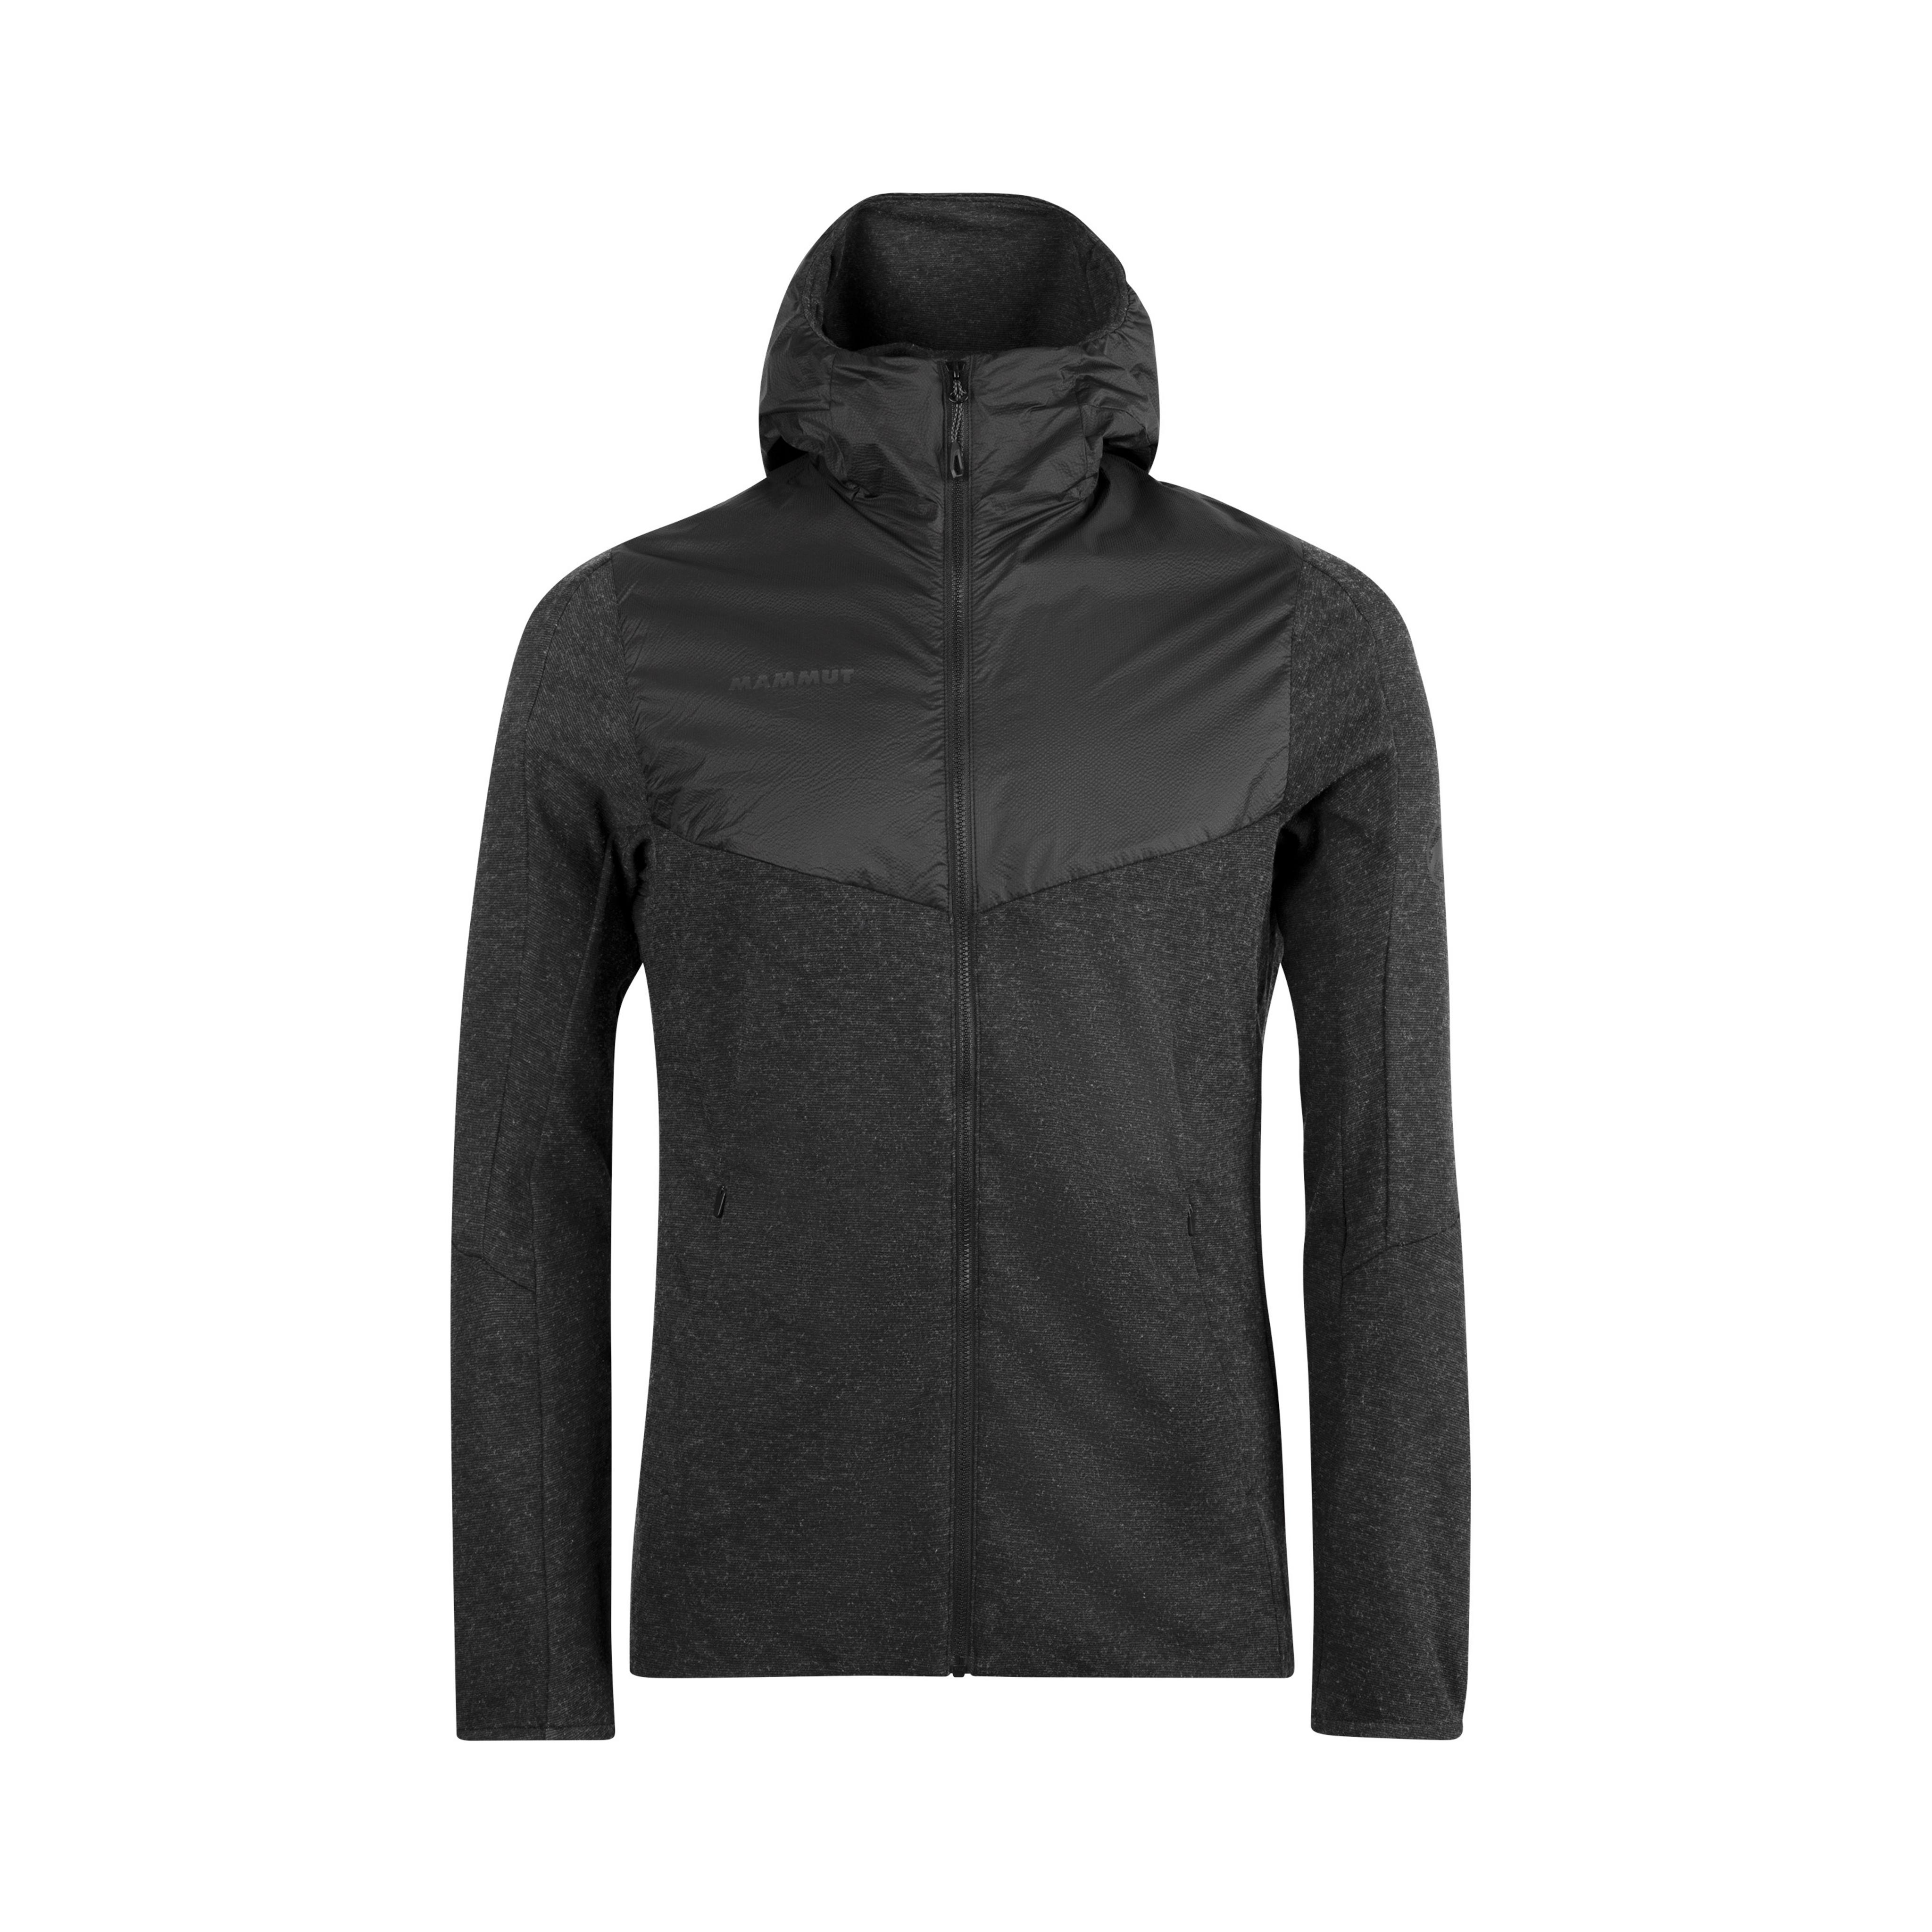 Alvra ML Hooded Jacket Men - black mélange-black, S thumbnail